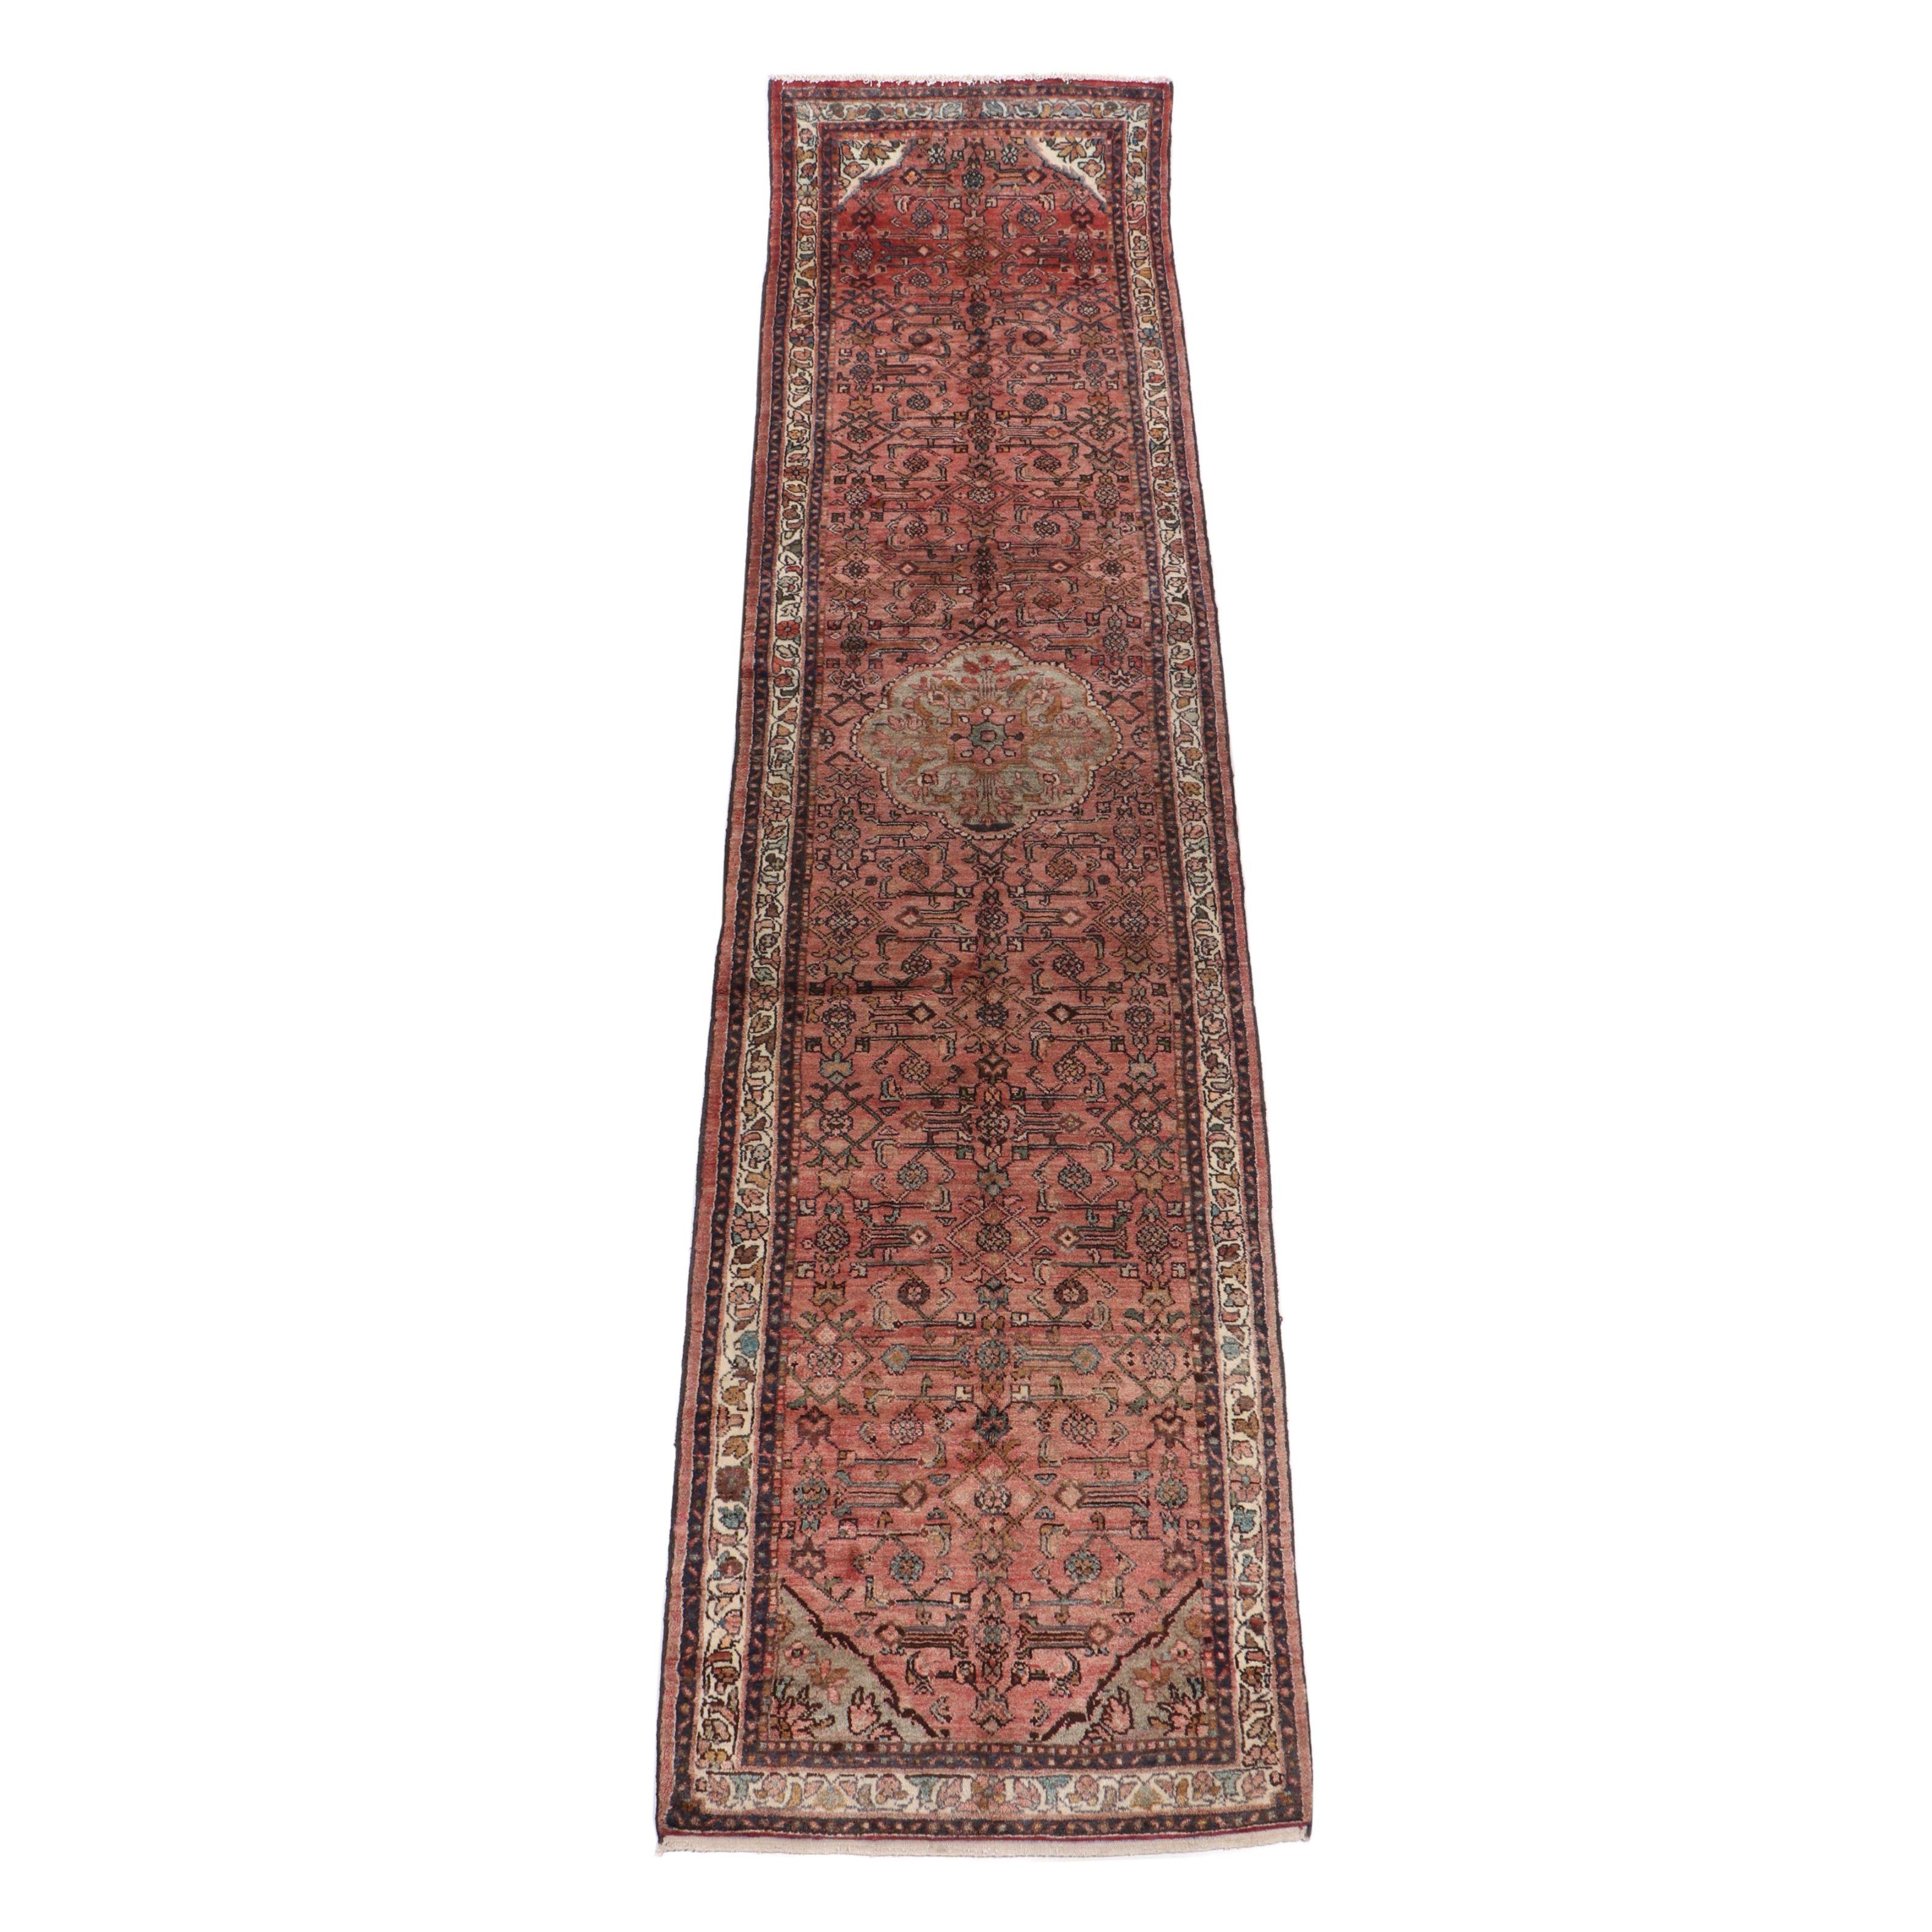 Hand-Knotted Persian Zanjan Wool Carpet Runner